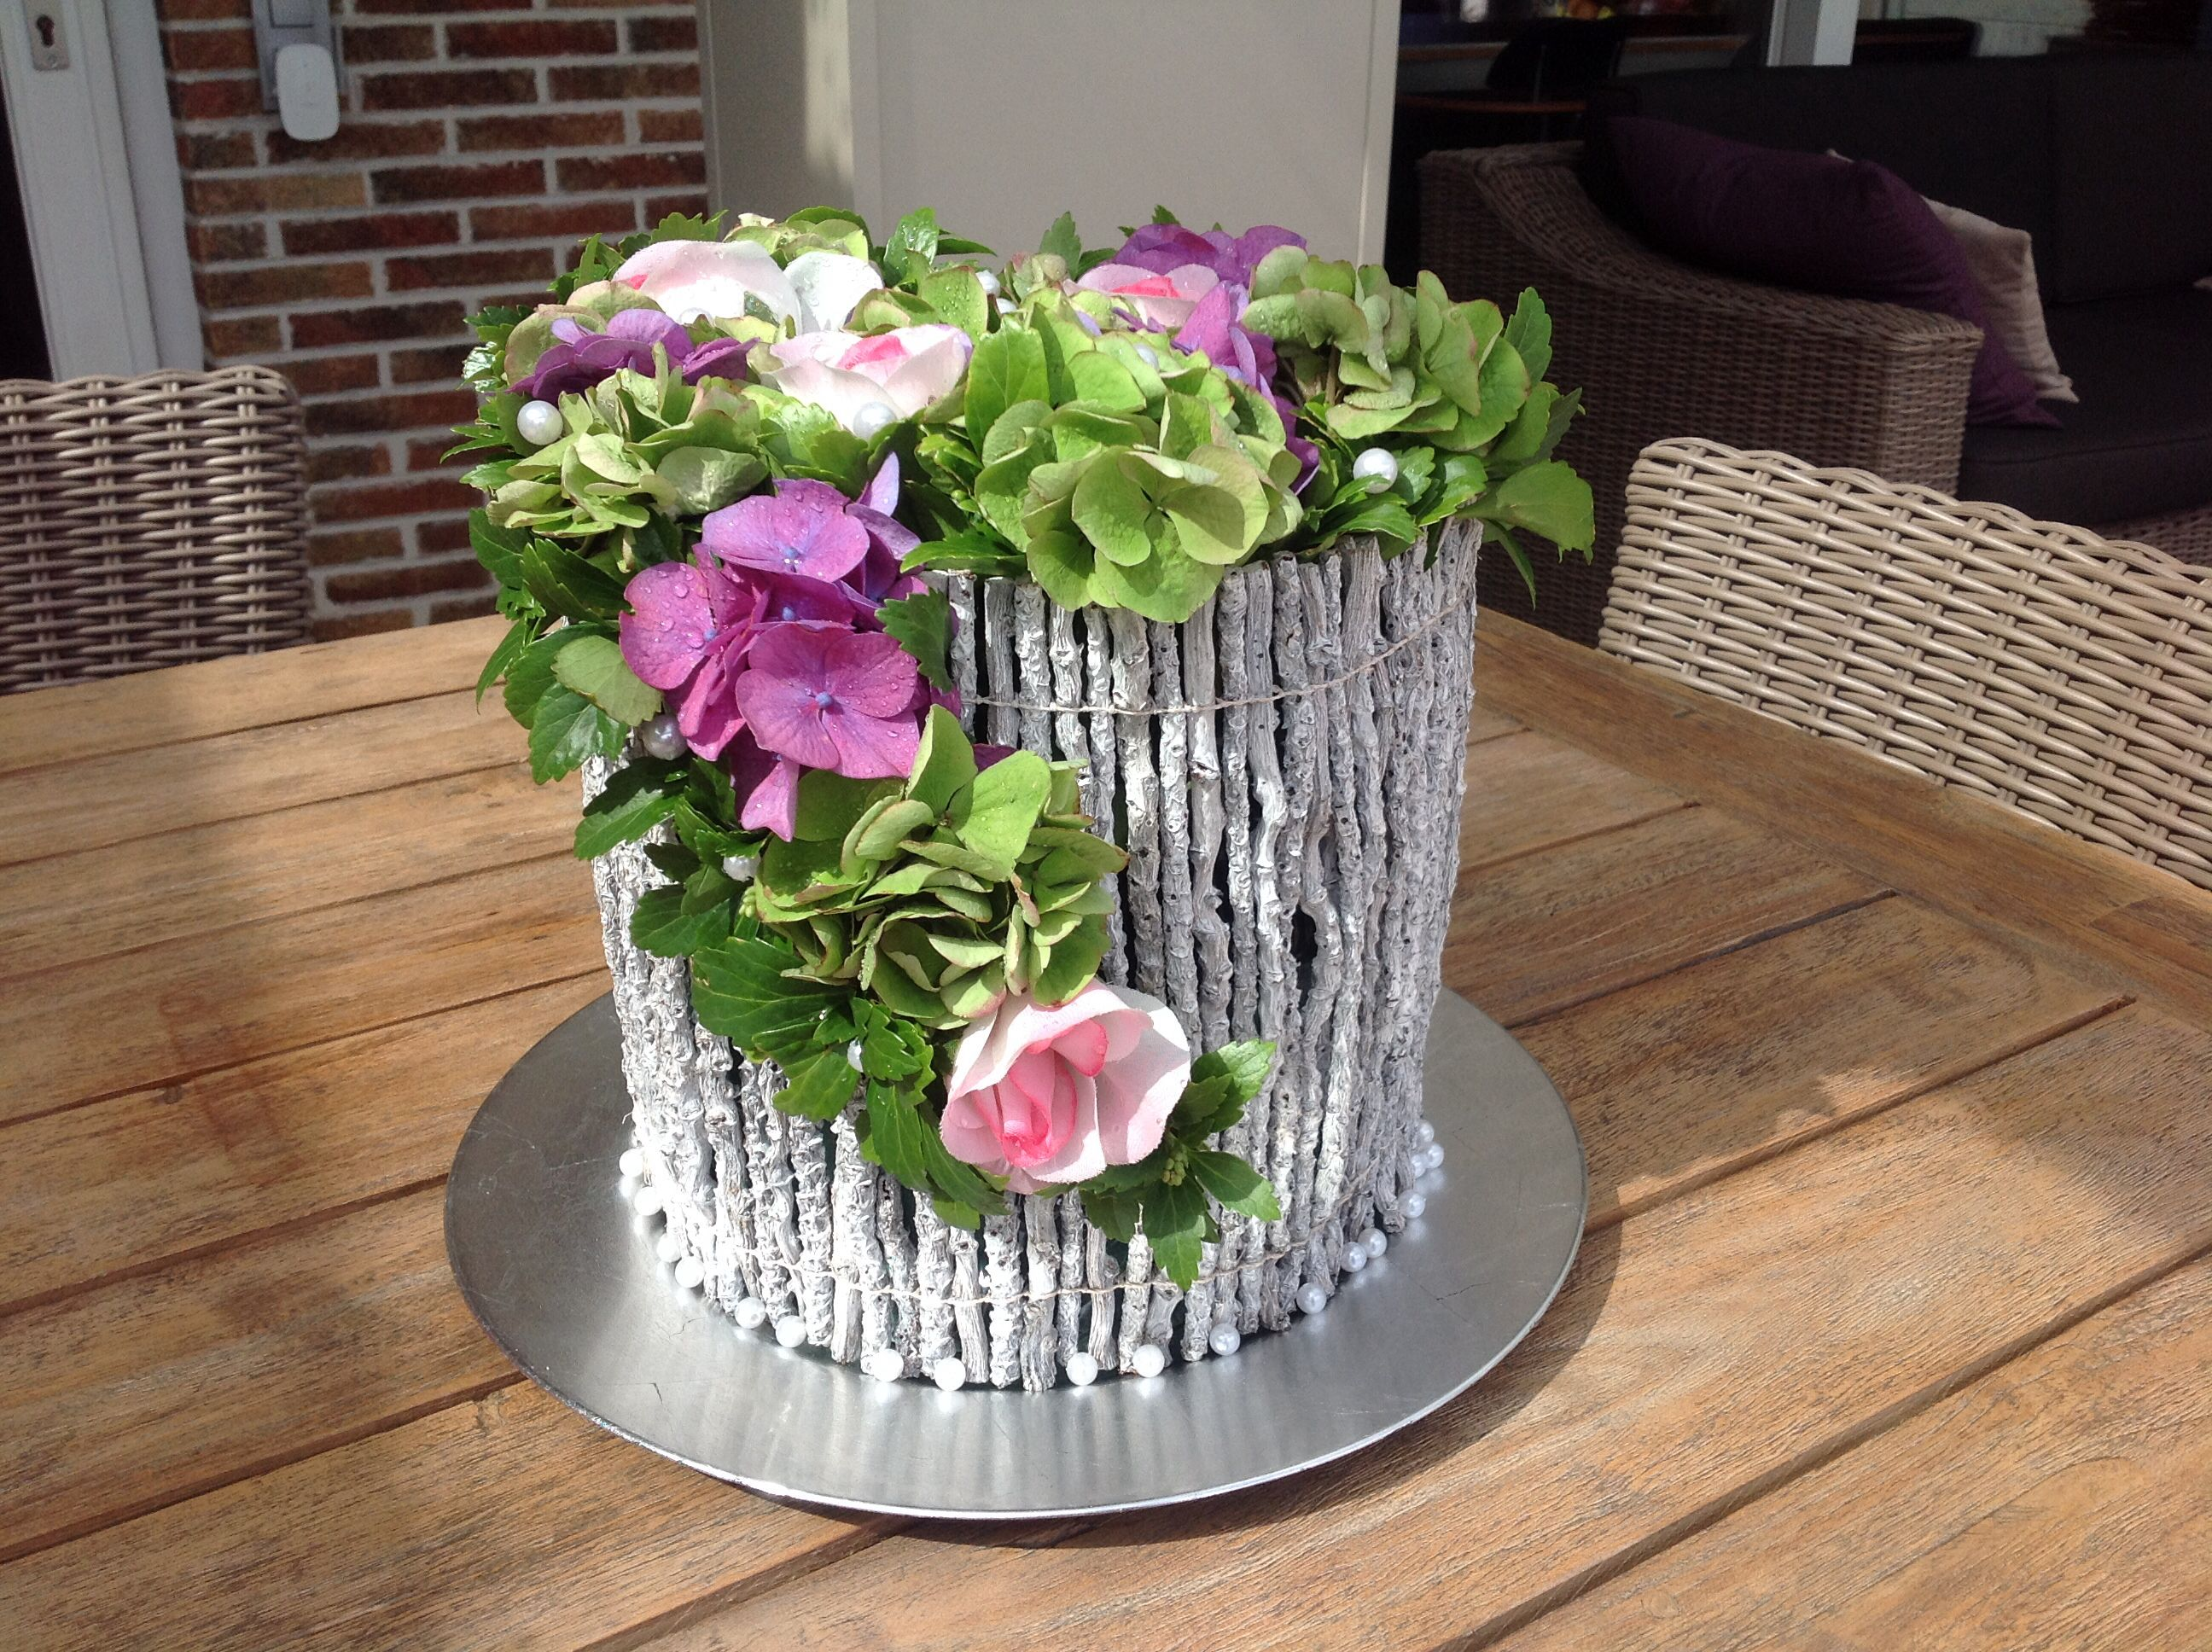 Diy Met Takken : Bloemstuk met witte takken en hortensia dekorácie pinterest